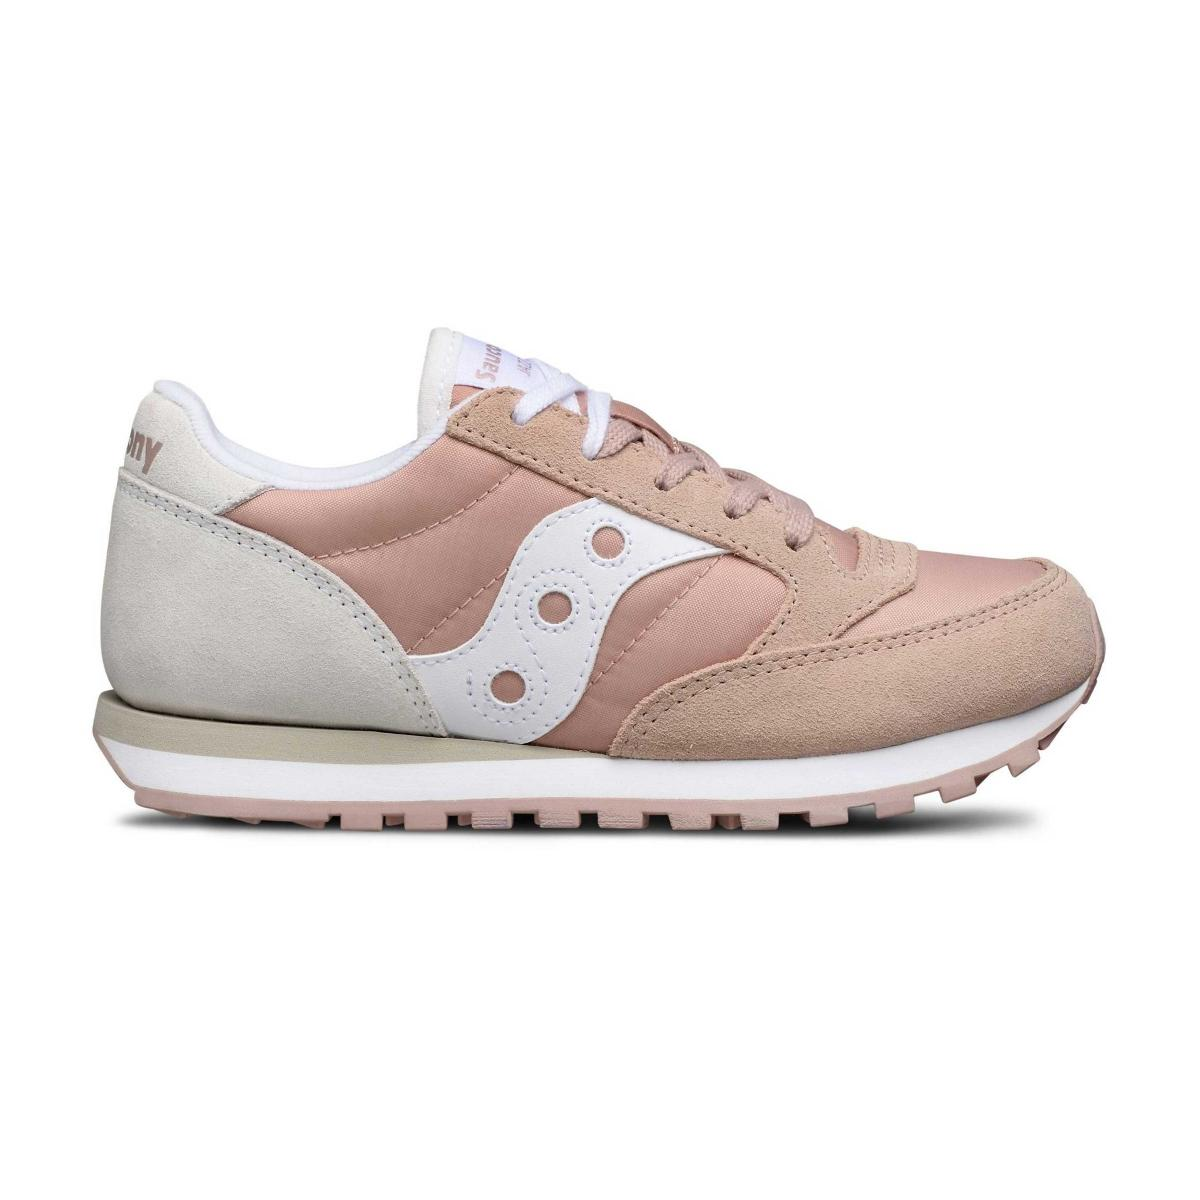 Scarpe Sneakers Saucony JAZZ ORIGINAL PINK/CREAM da bambina rif. SK161004